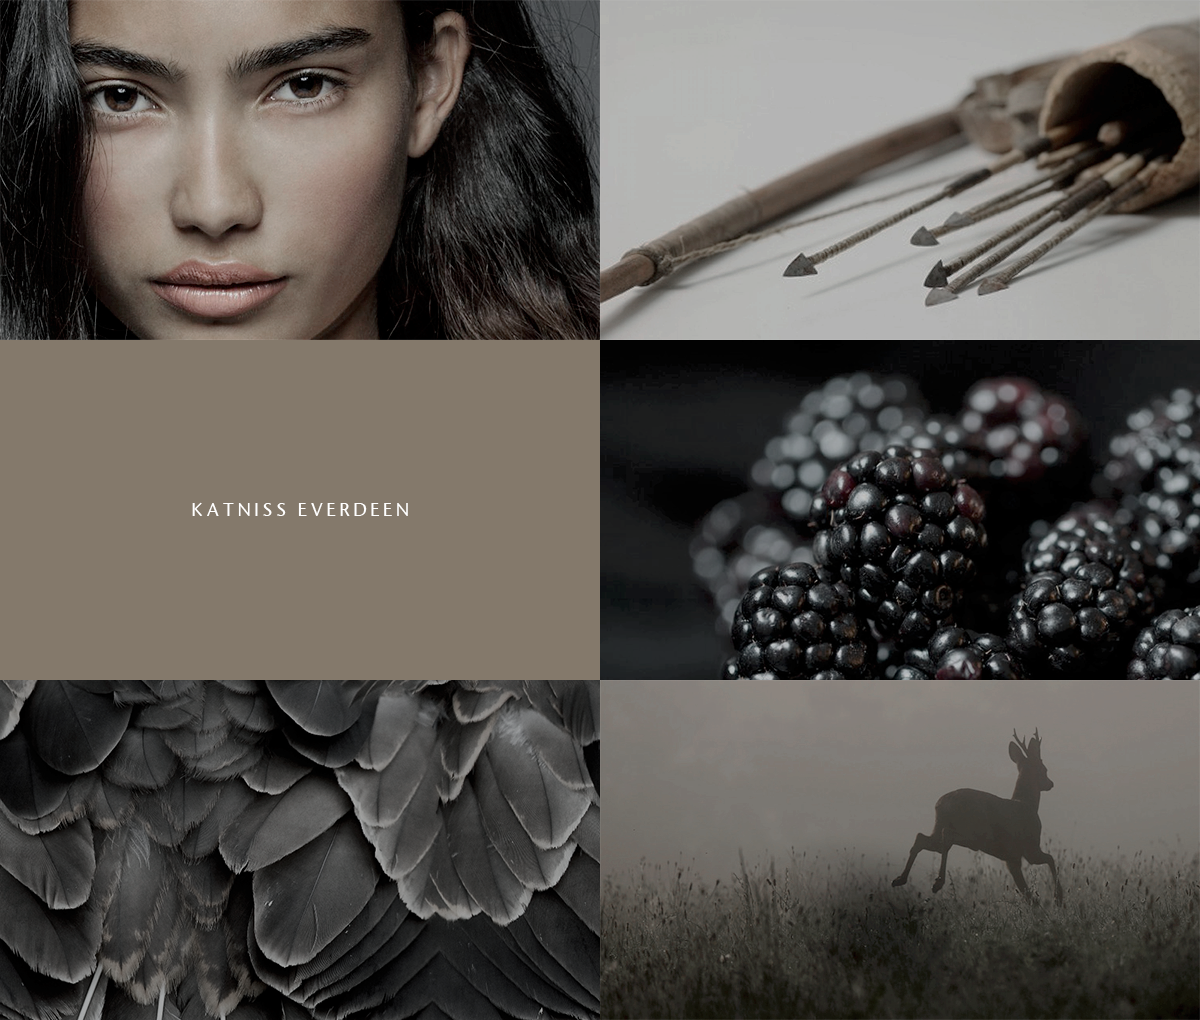 The Hunger Games: Mockingjay Katniss Everdeen Makeup - YouTube